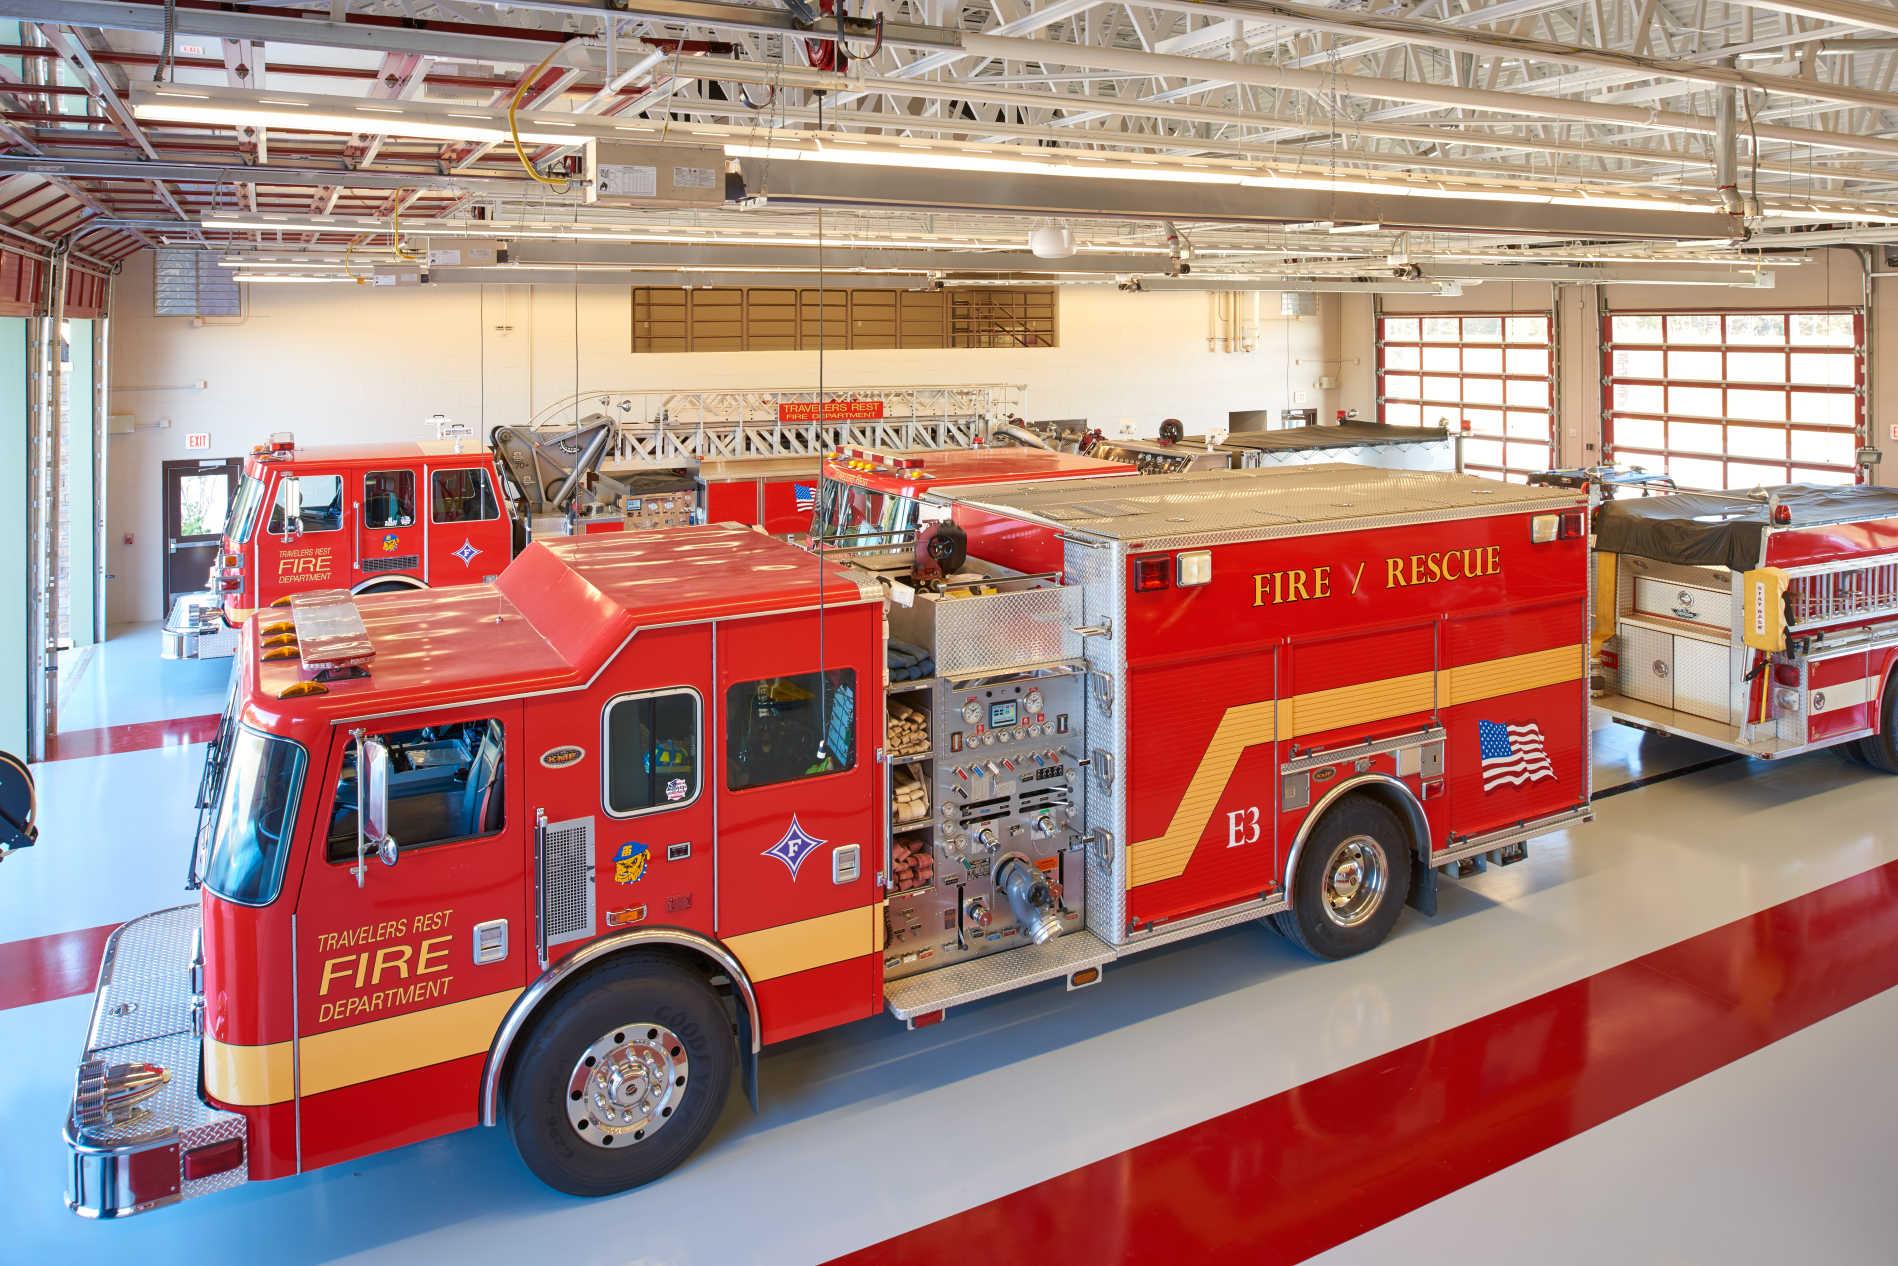 Interior Fire House Design - Travelers Rest